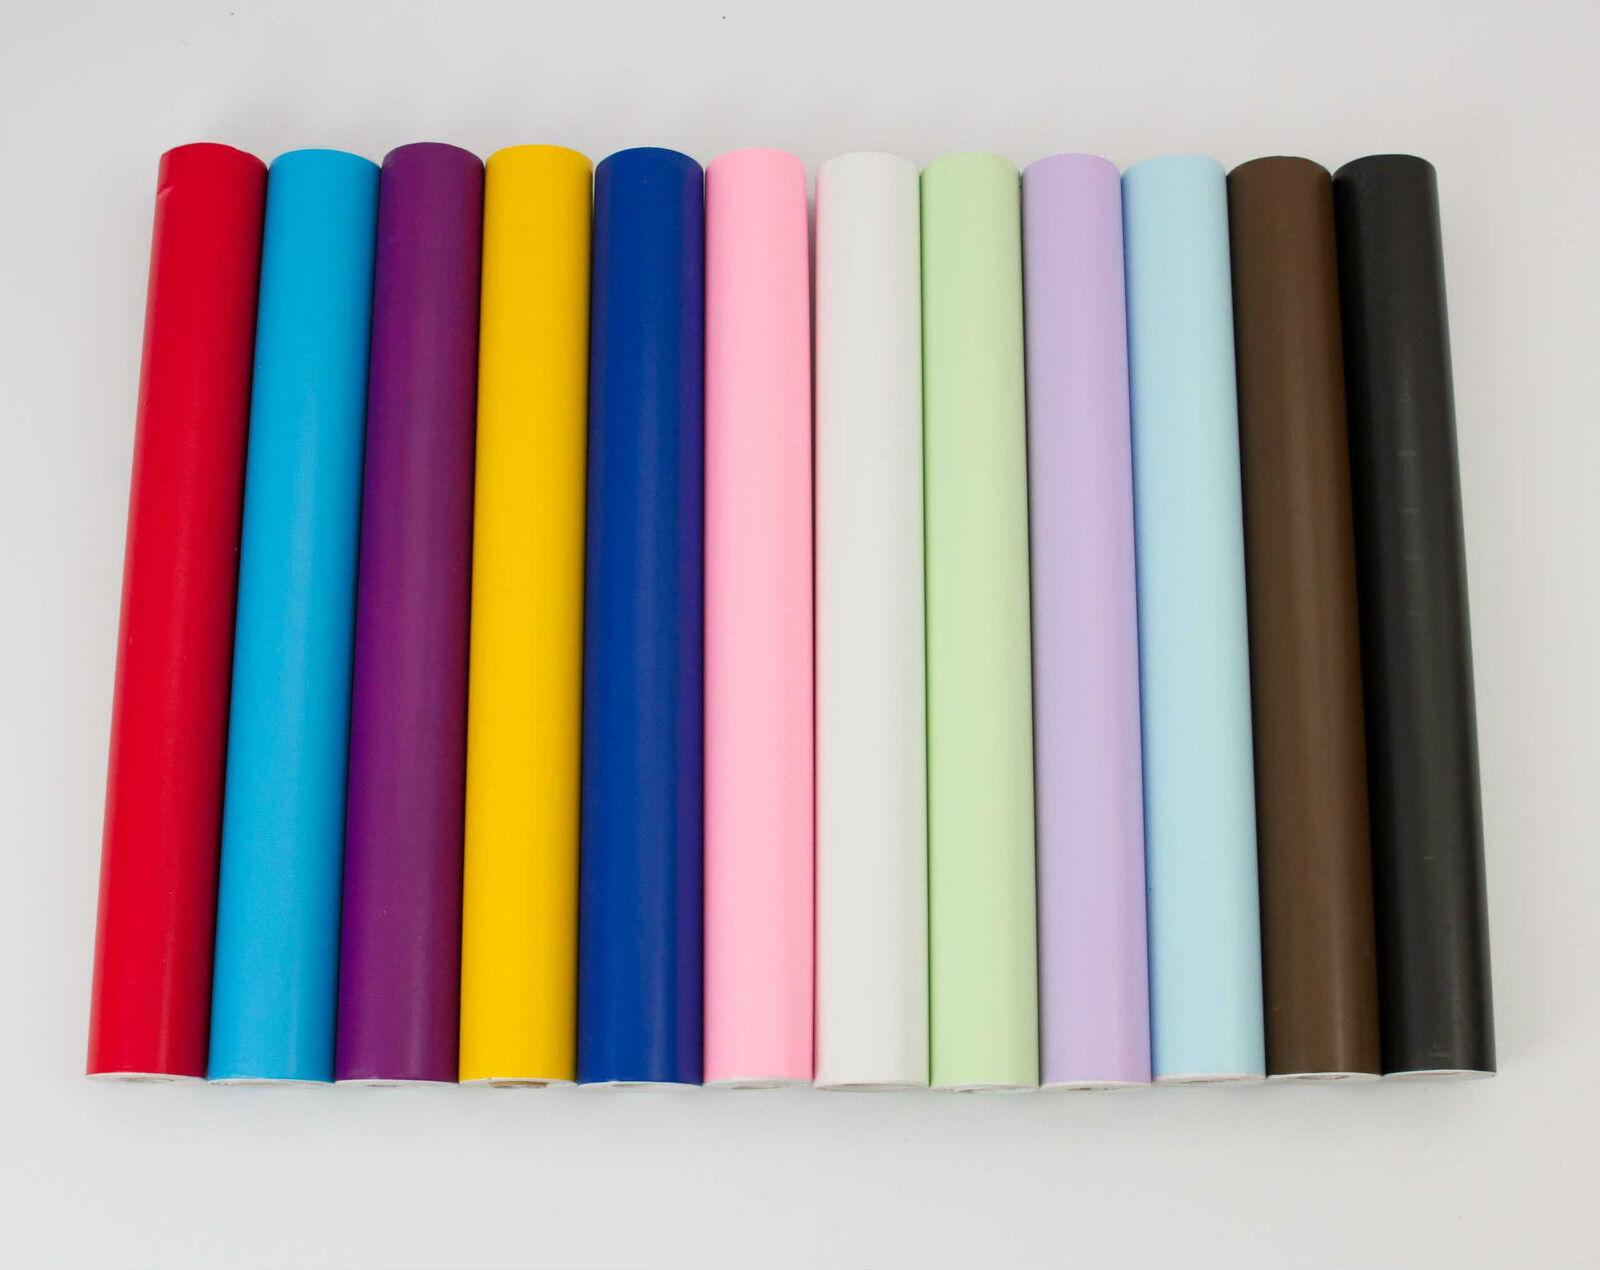 10M ROLL STICKY BACK PLASTIC SELF ADHESIVE Vinyl PVC